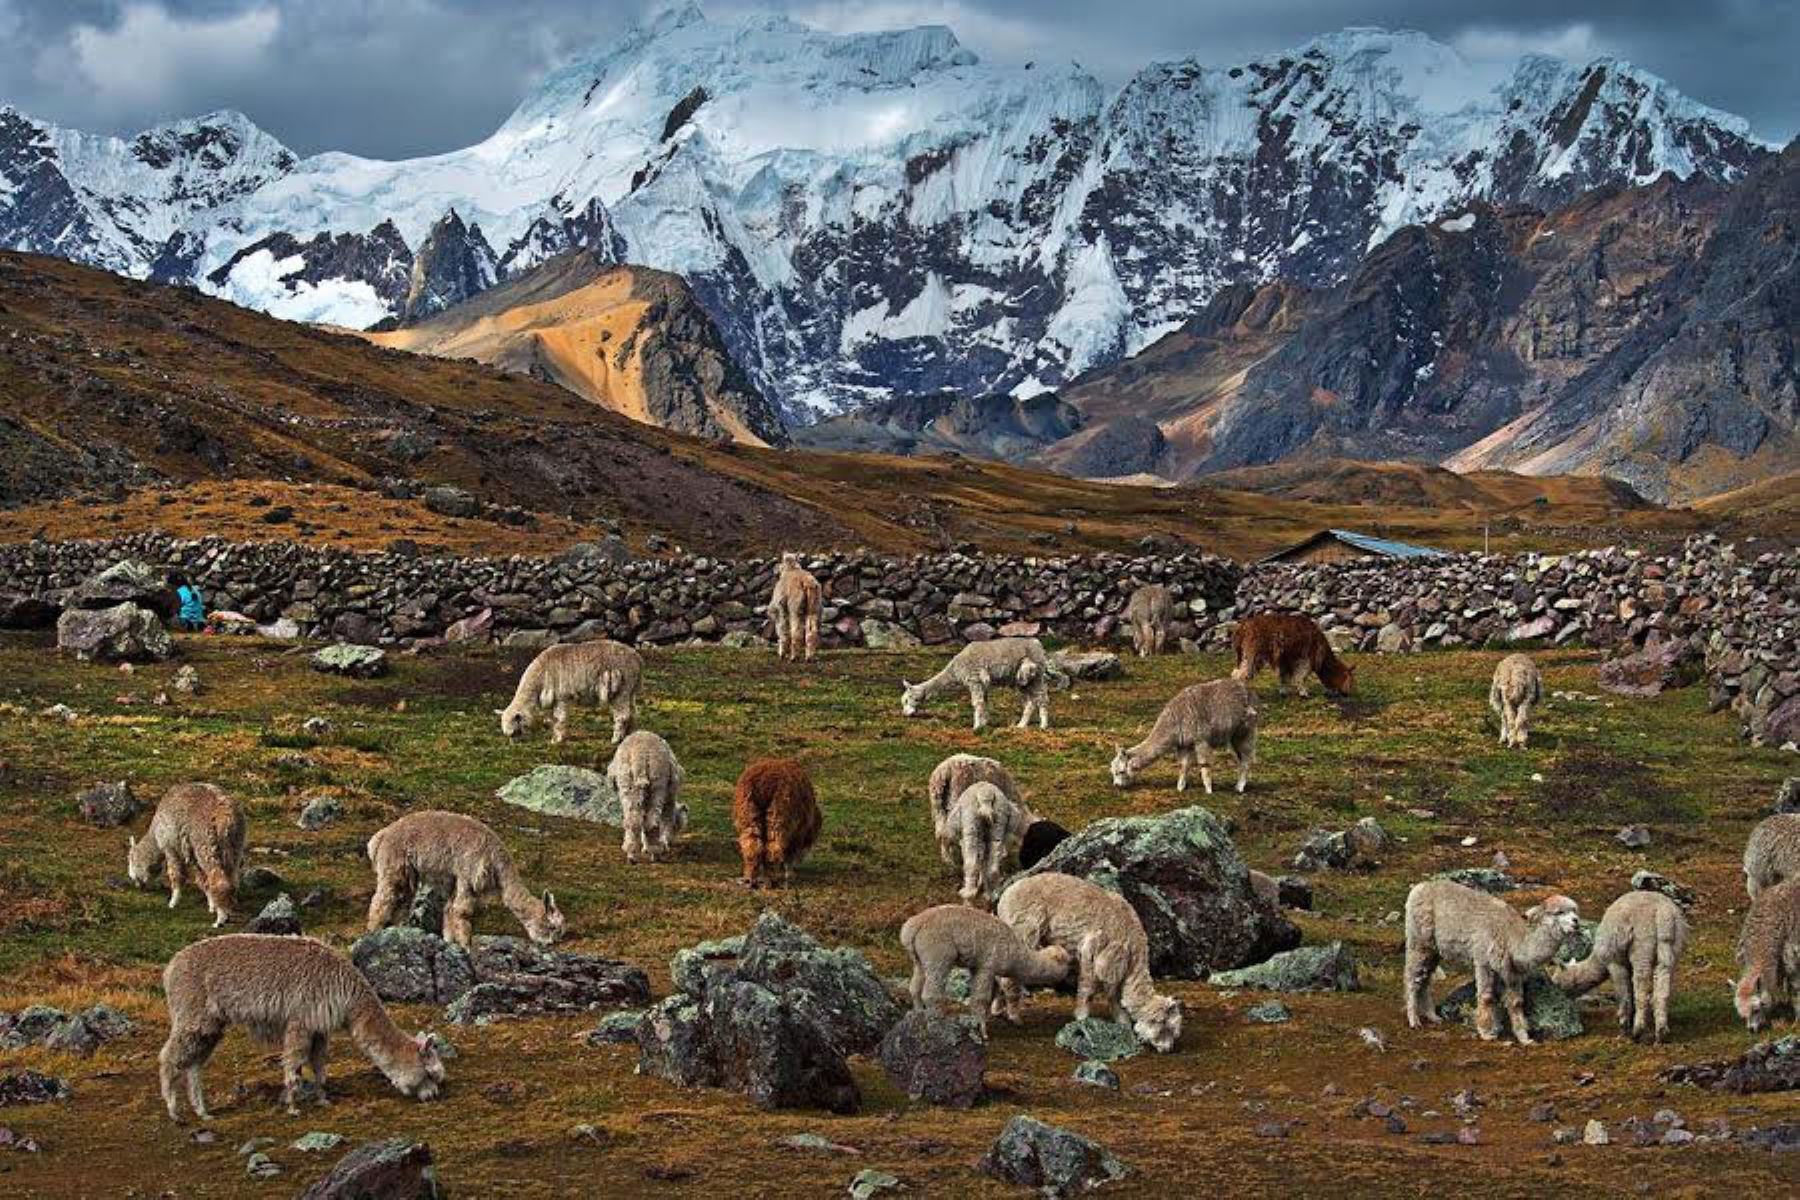 Cusco sembrará 7 millones de especies nativas en Área de Conservación Ausangate. ANDINA/Difusión